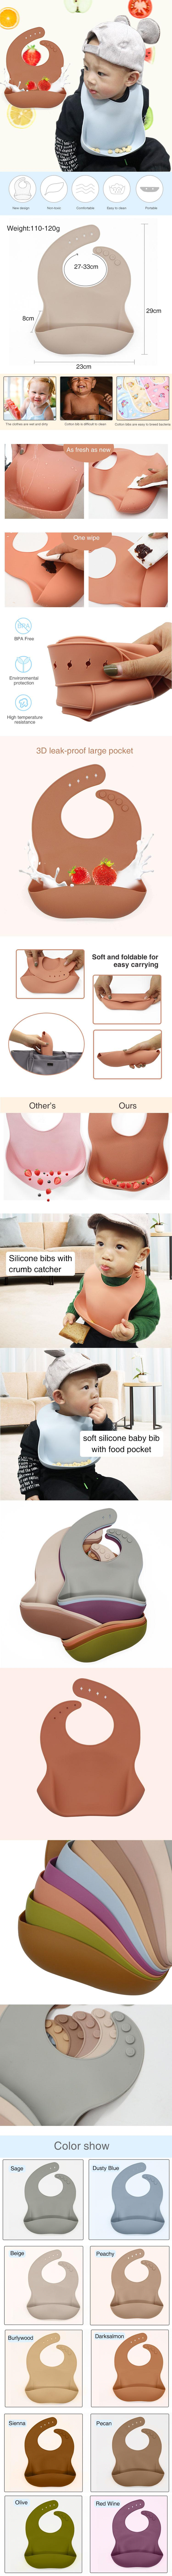 best silicone bib